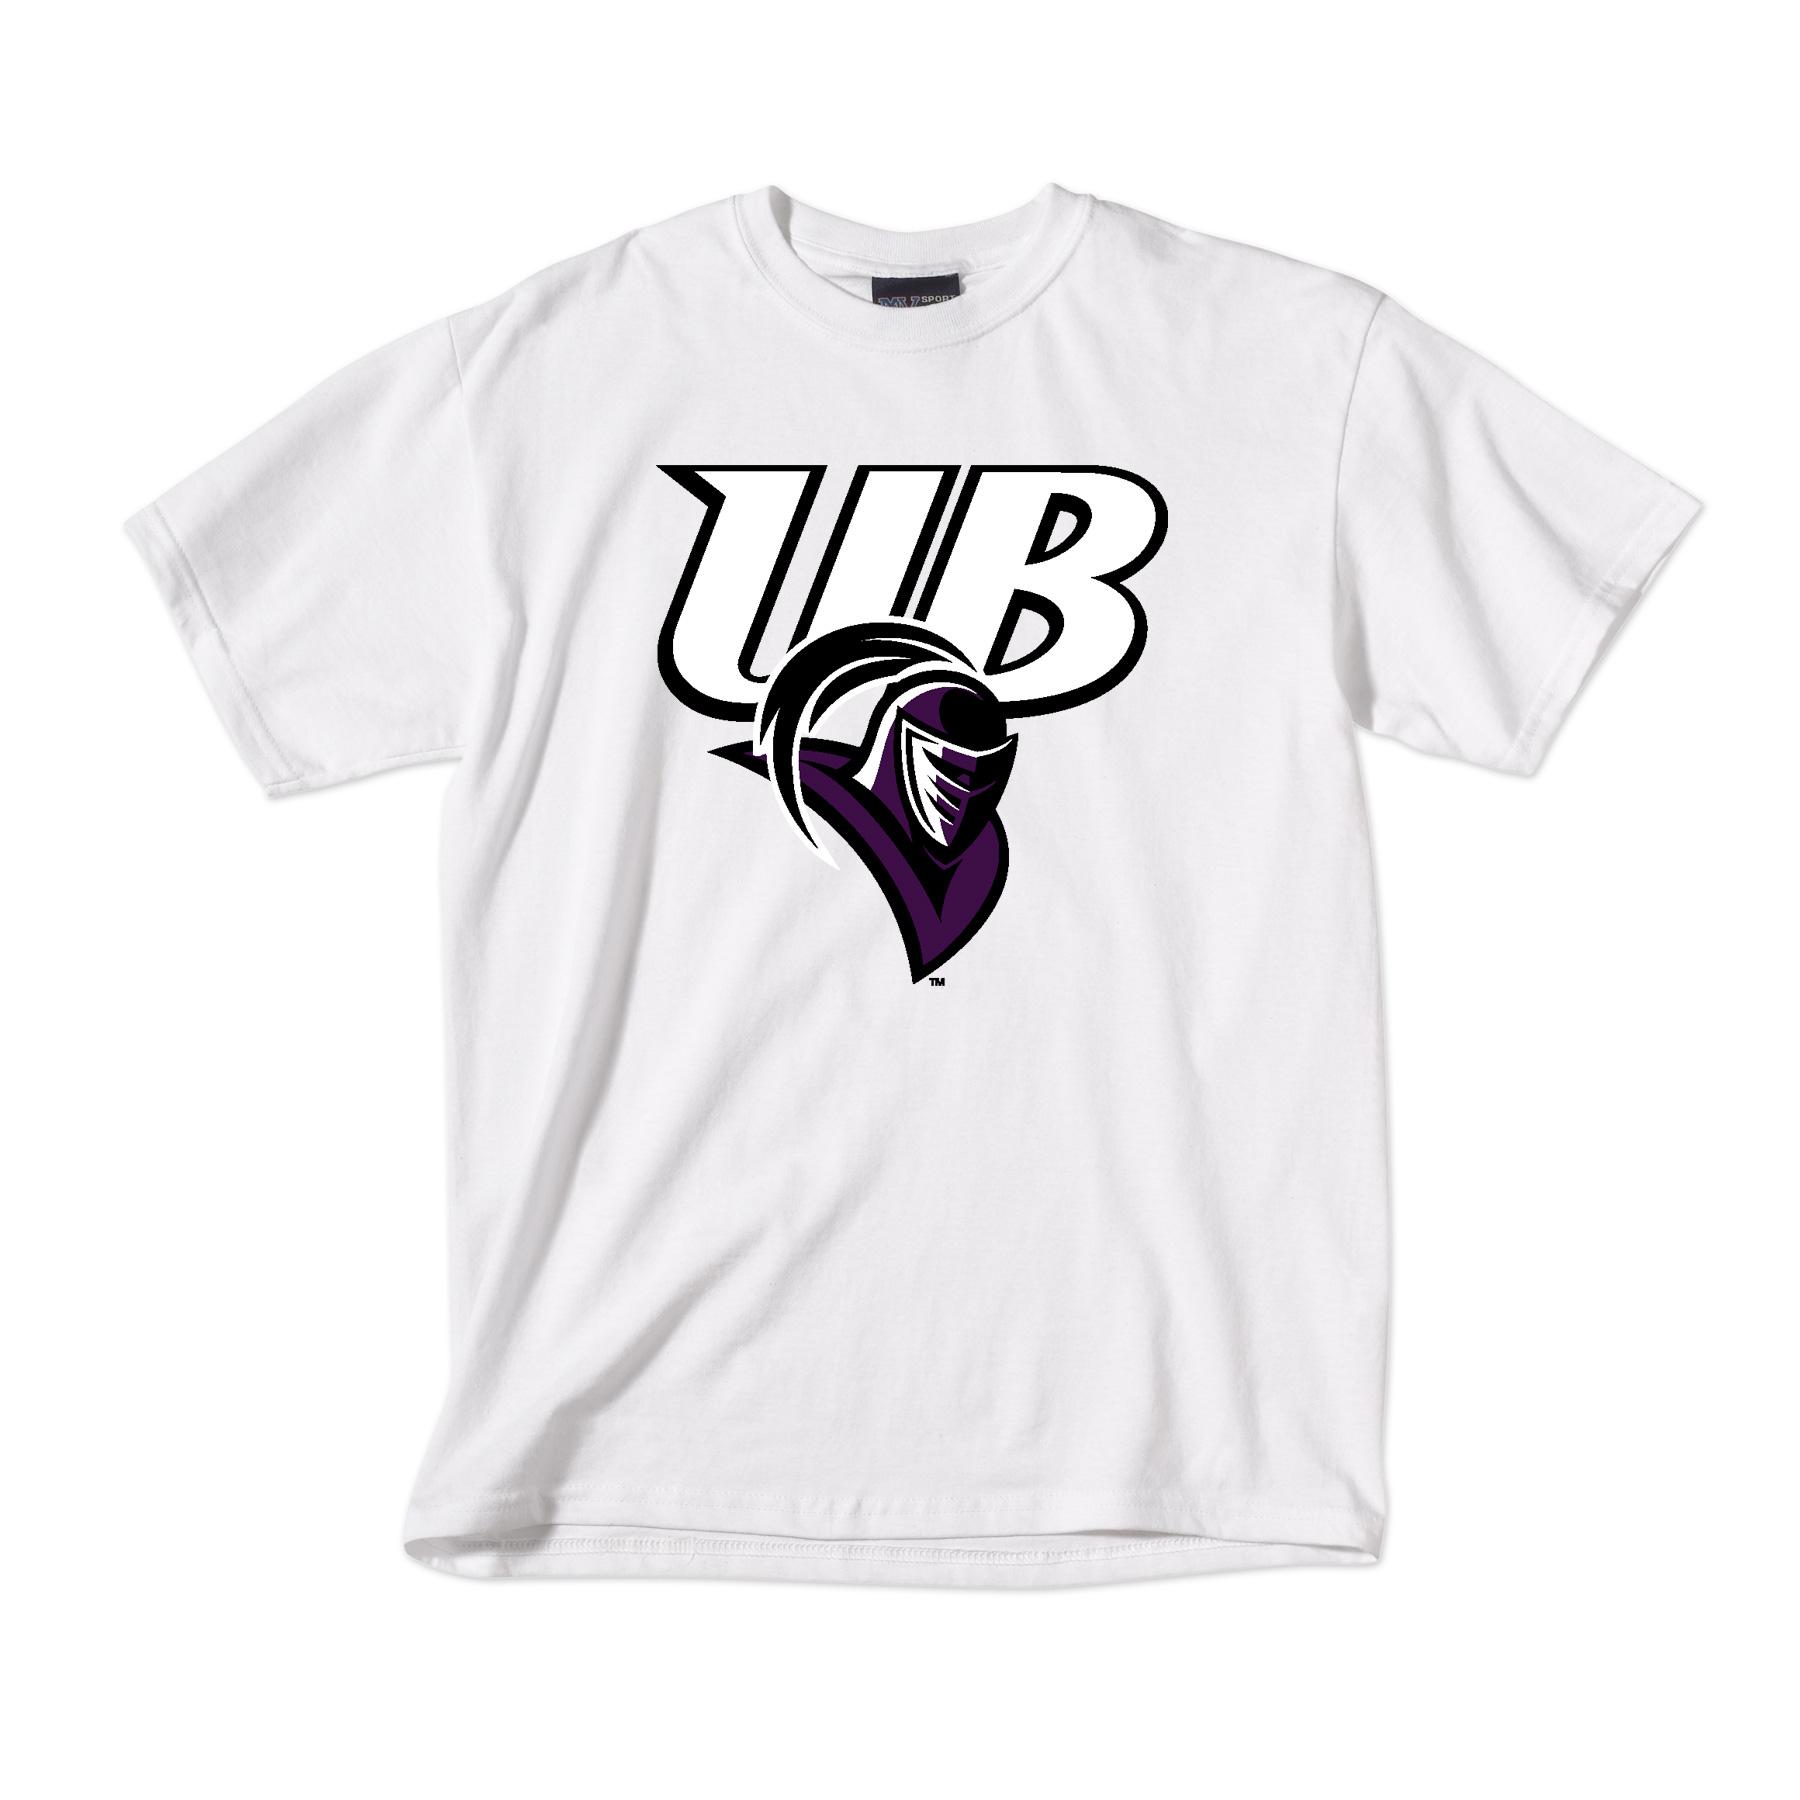 UB Knights Tee - White